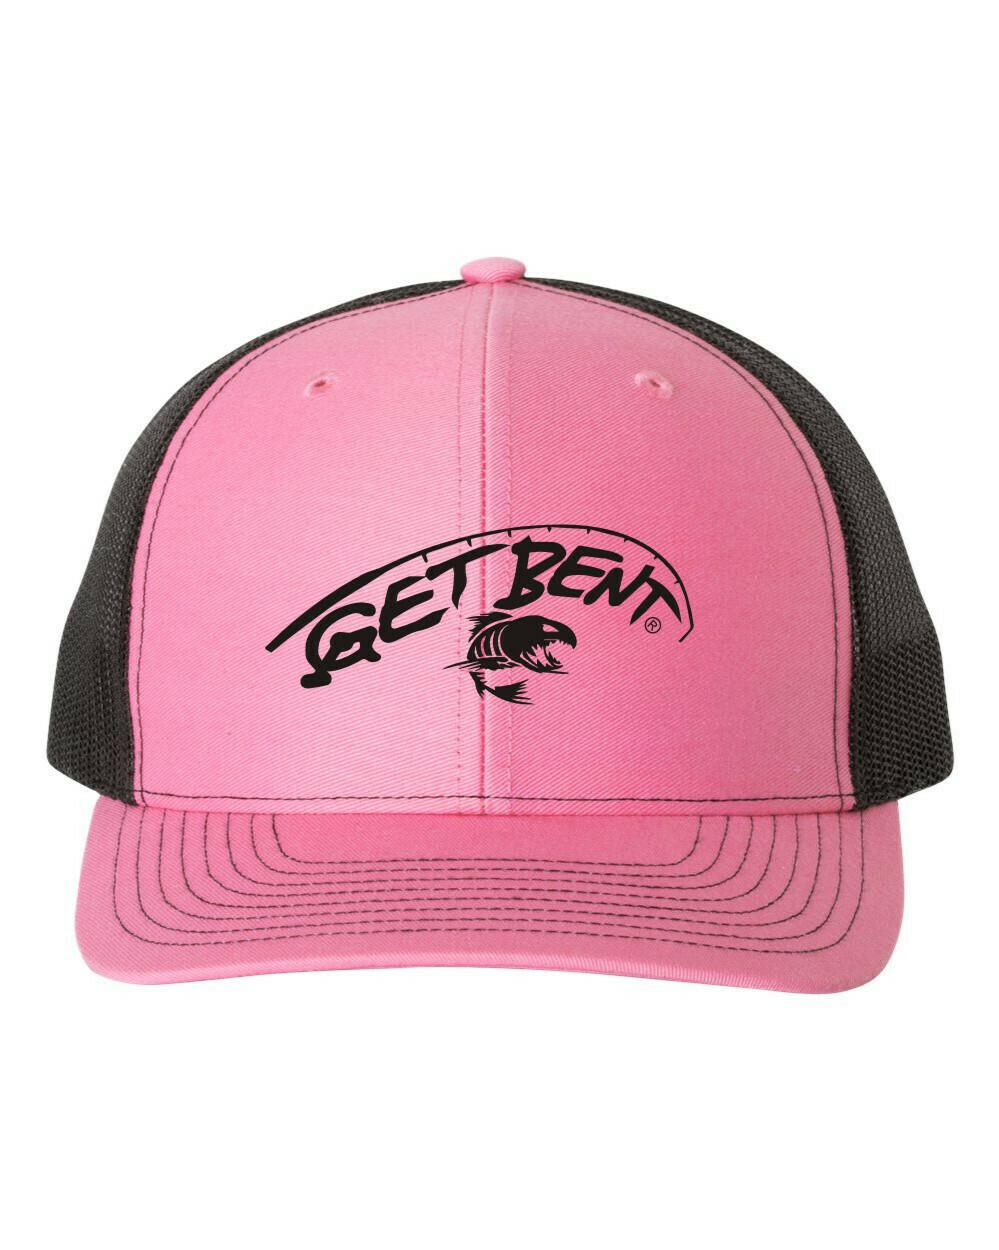 'Get Bent' - Richardson Trucker - Pink/Black